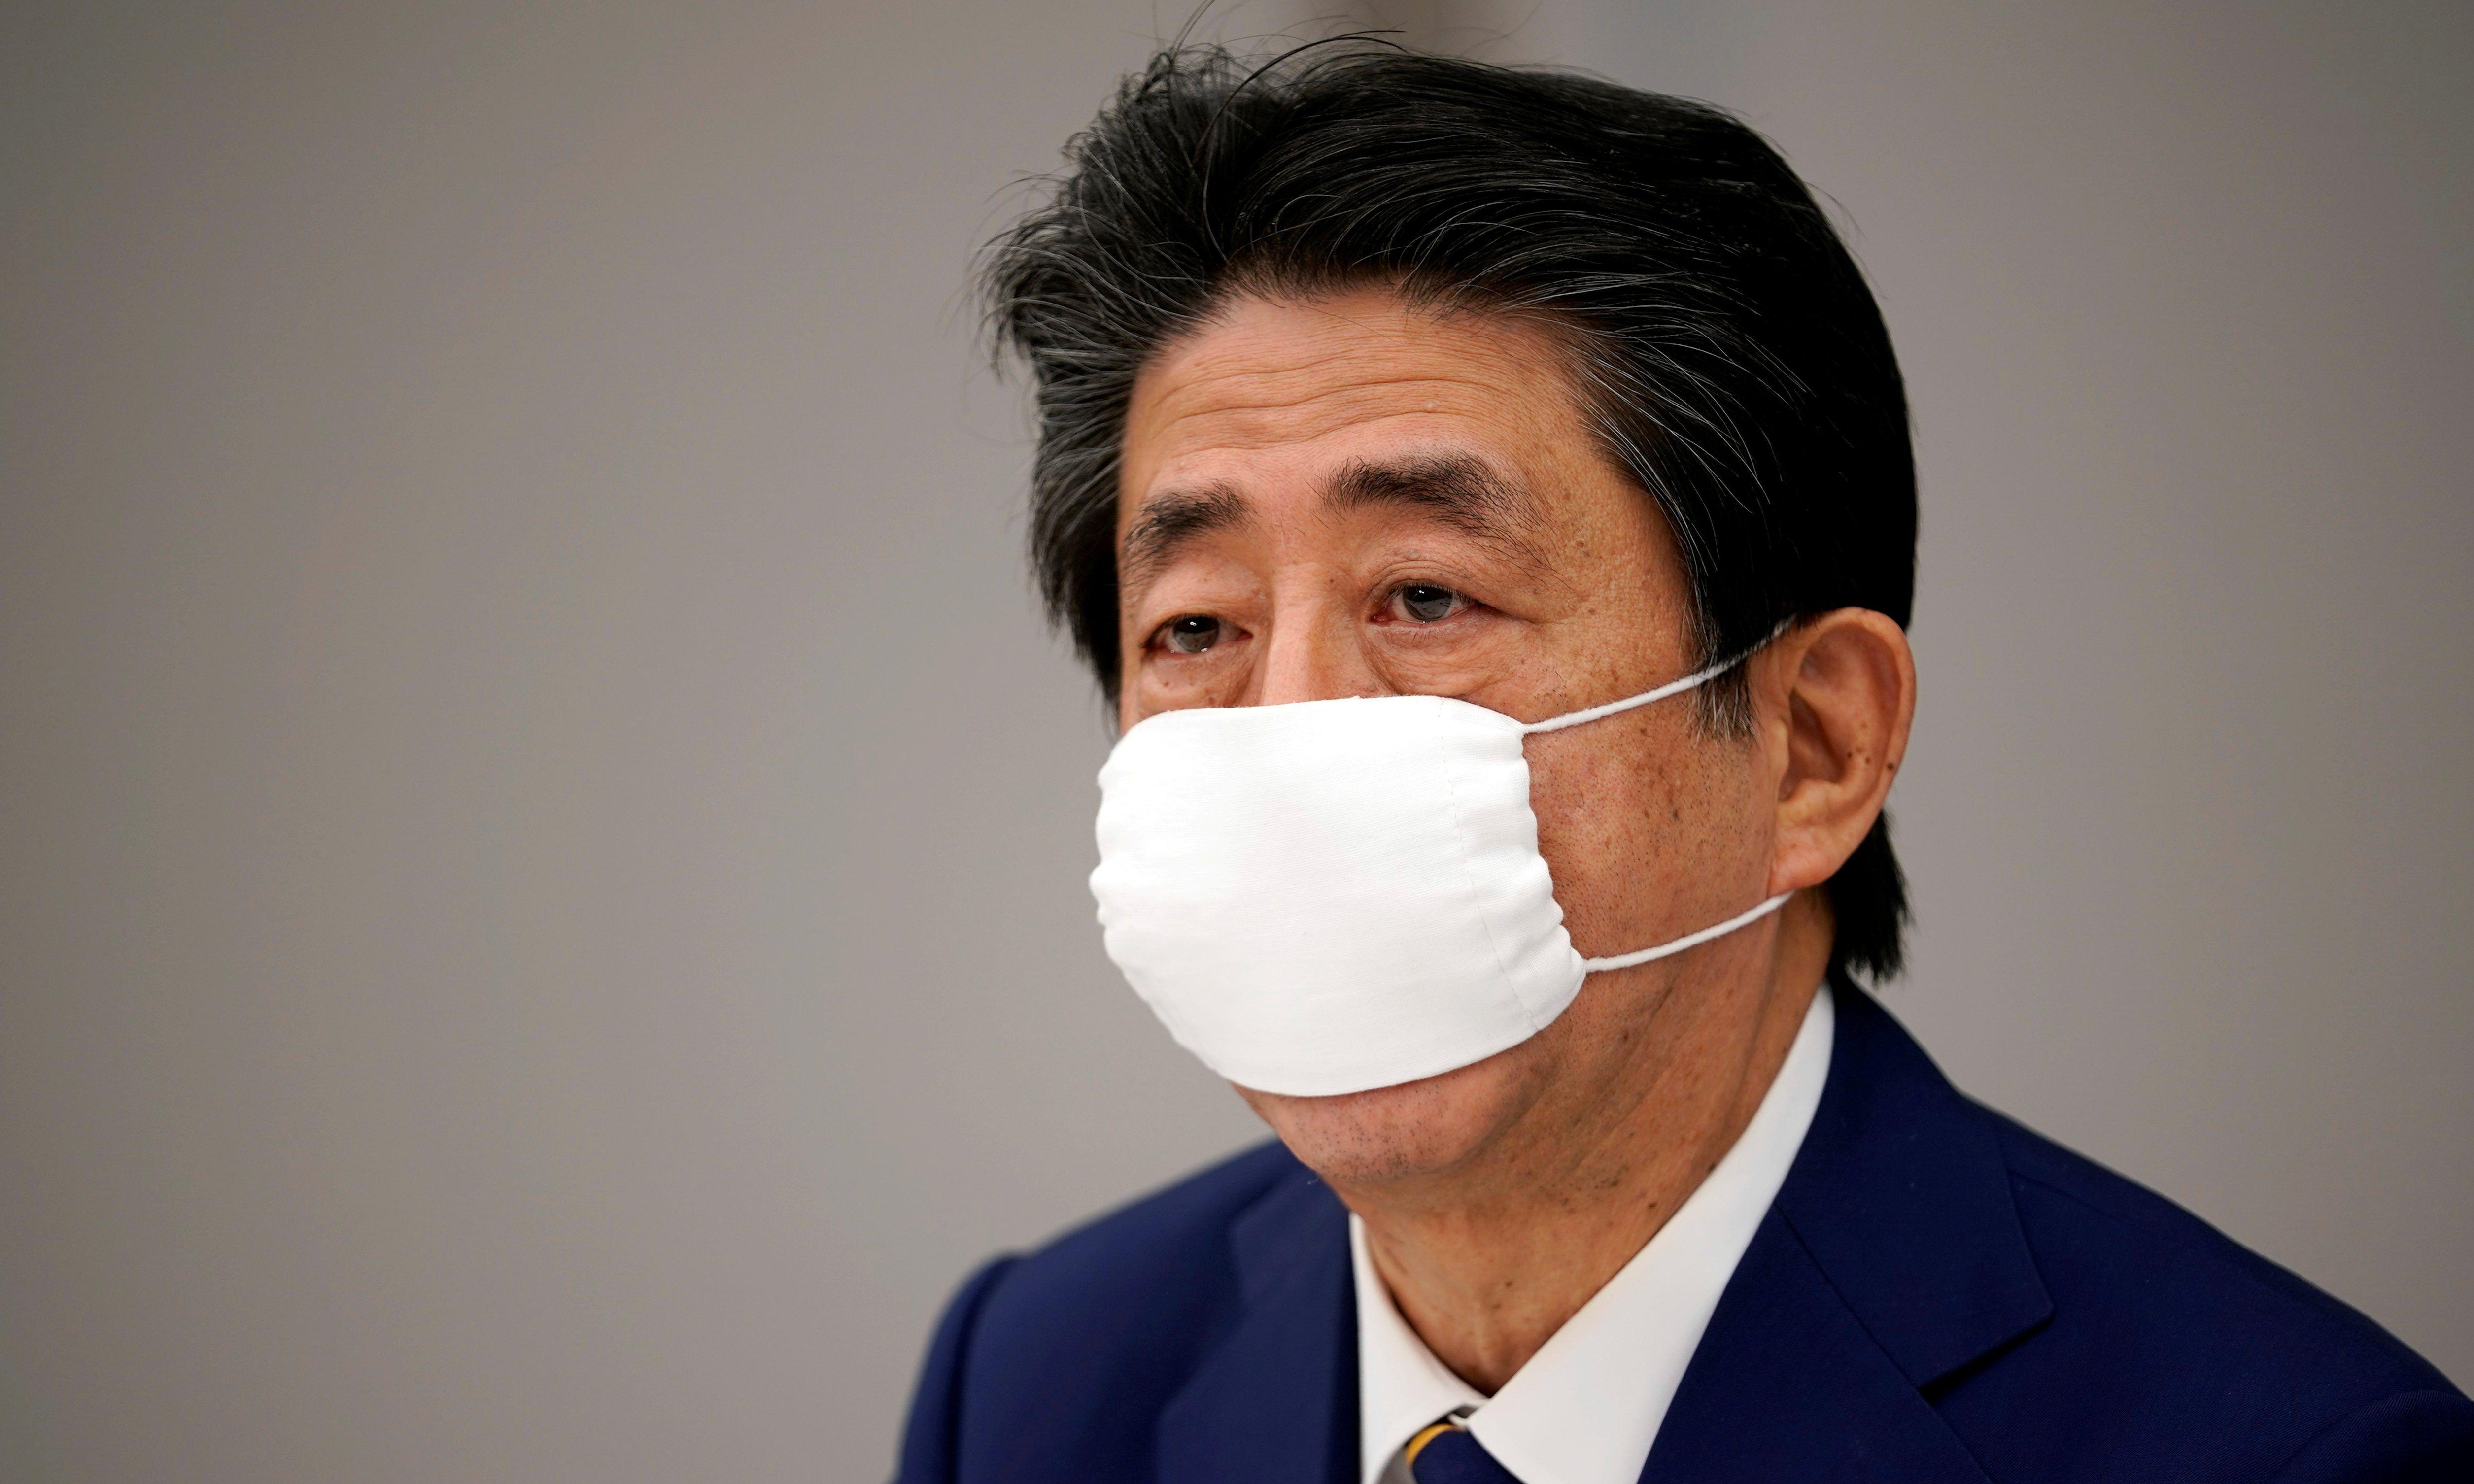 Japan finally decided to hold a virtual cabinet meeting as a coronavirus precaution